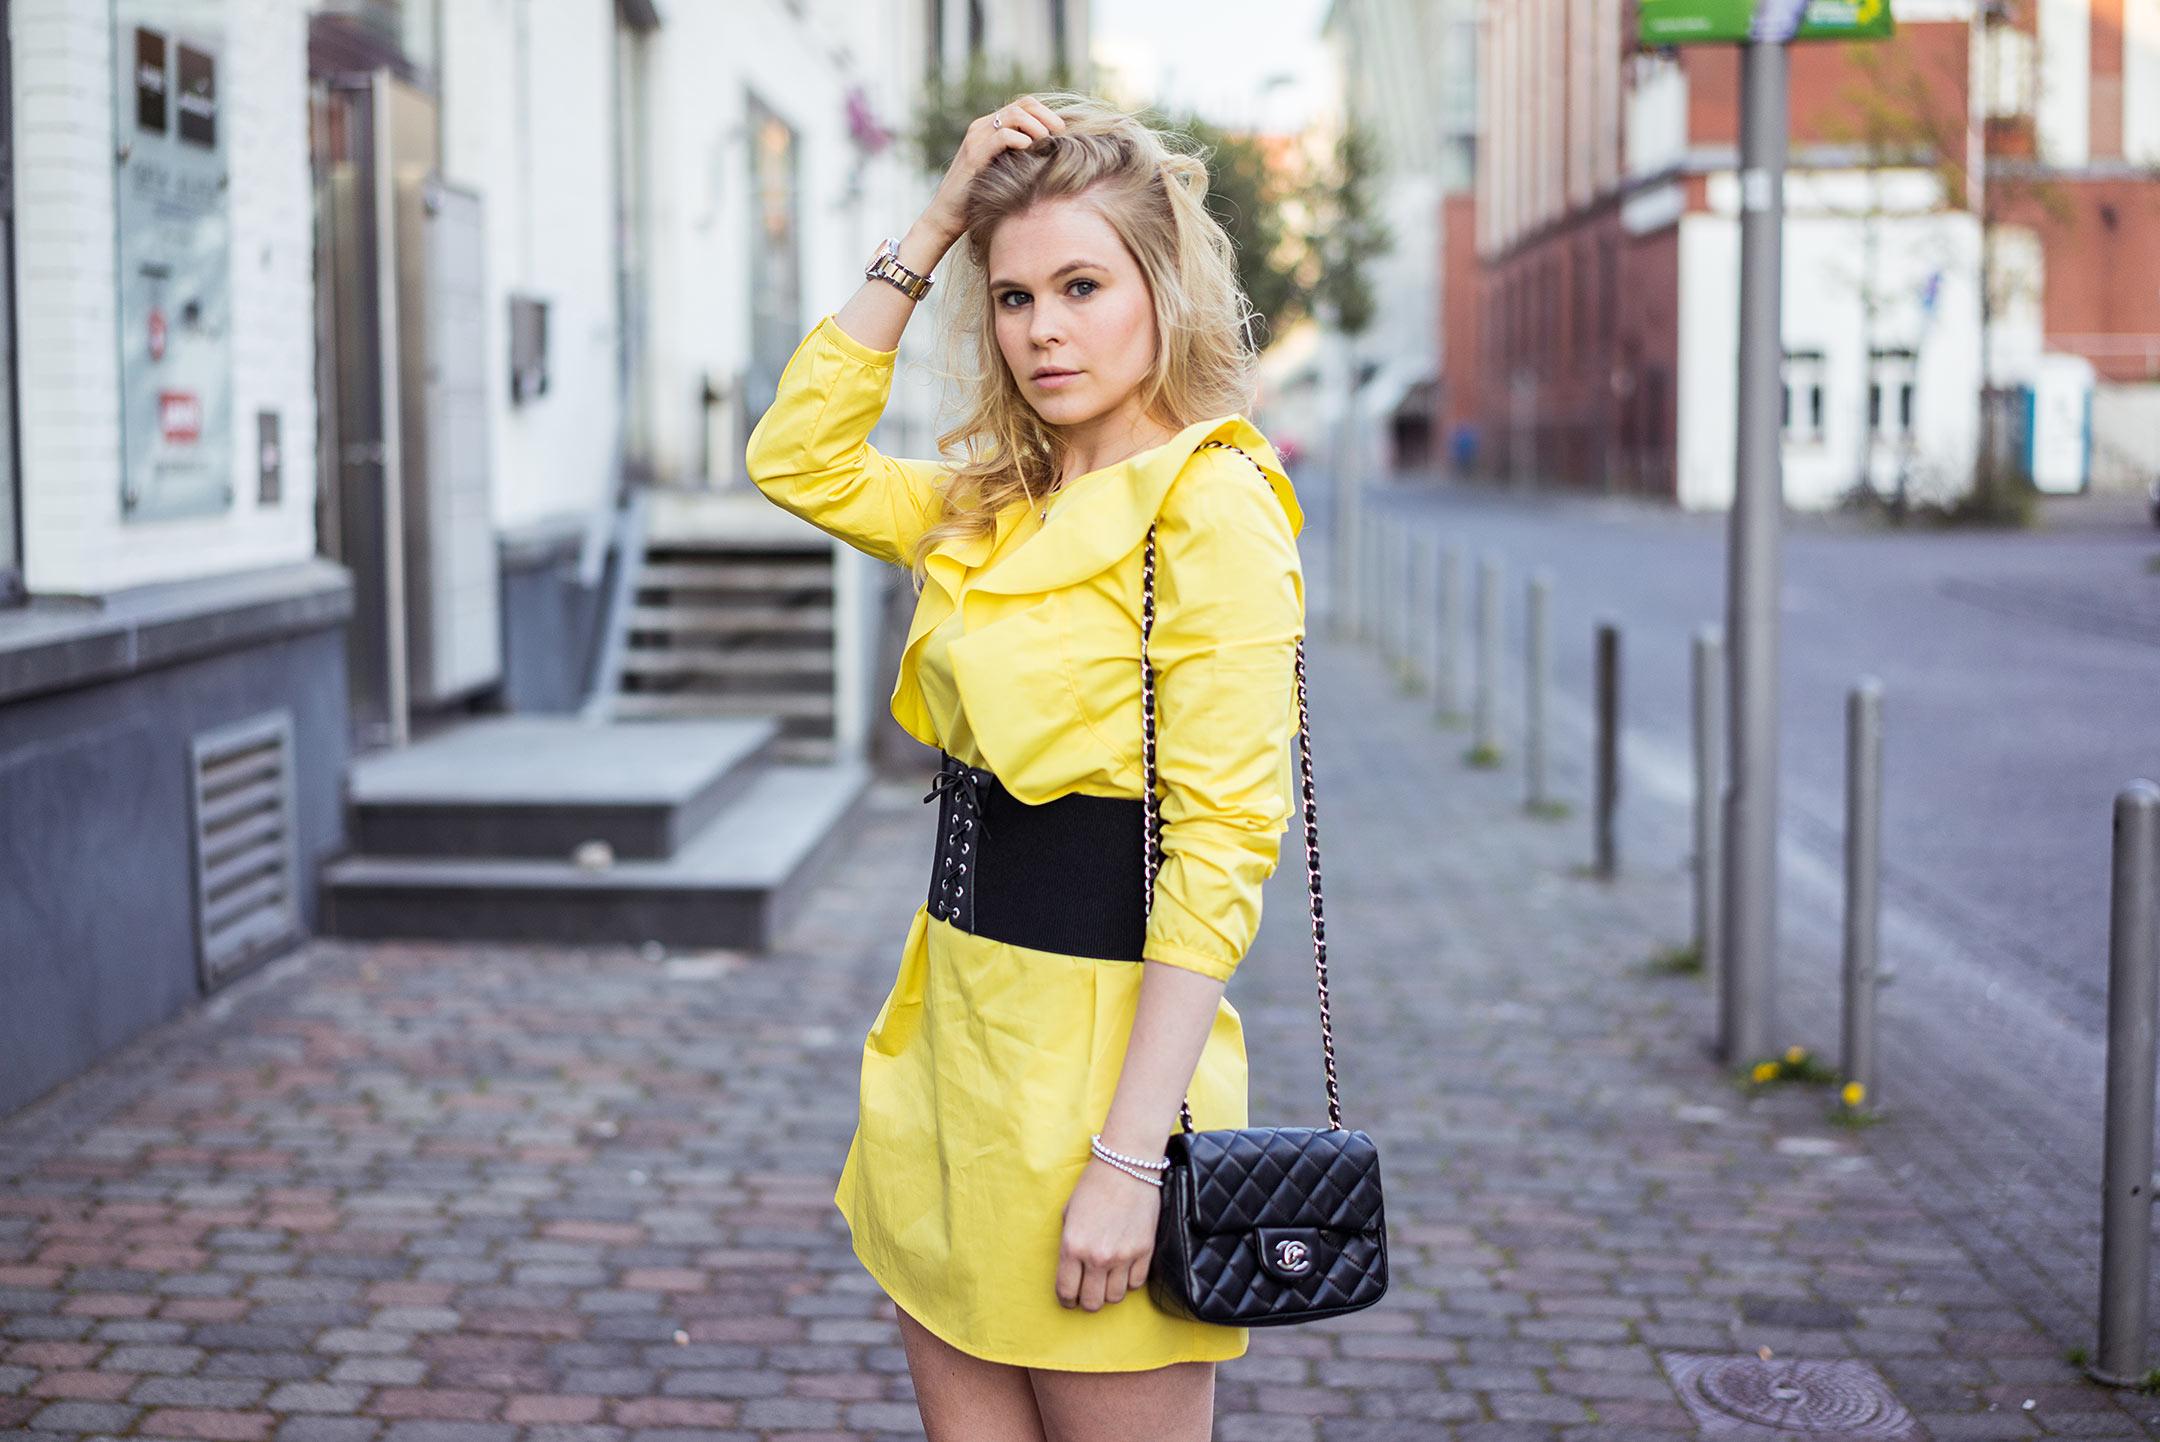 Korsett Gürtel schwarz Kleid Modeblog Sunnyinga Düsseldorf